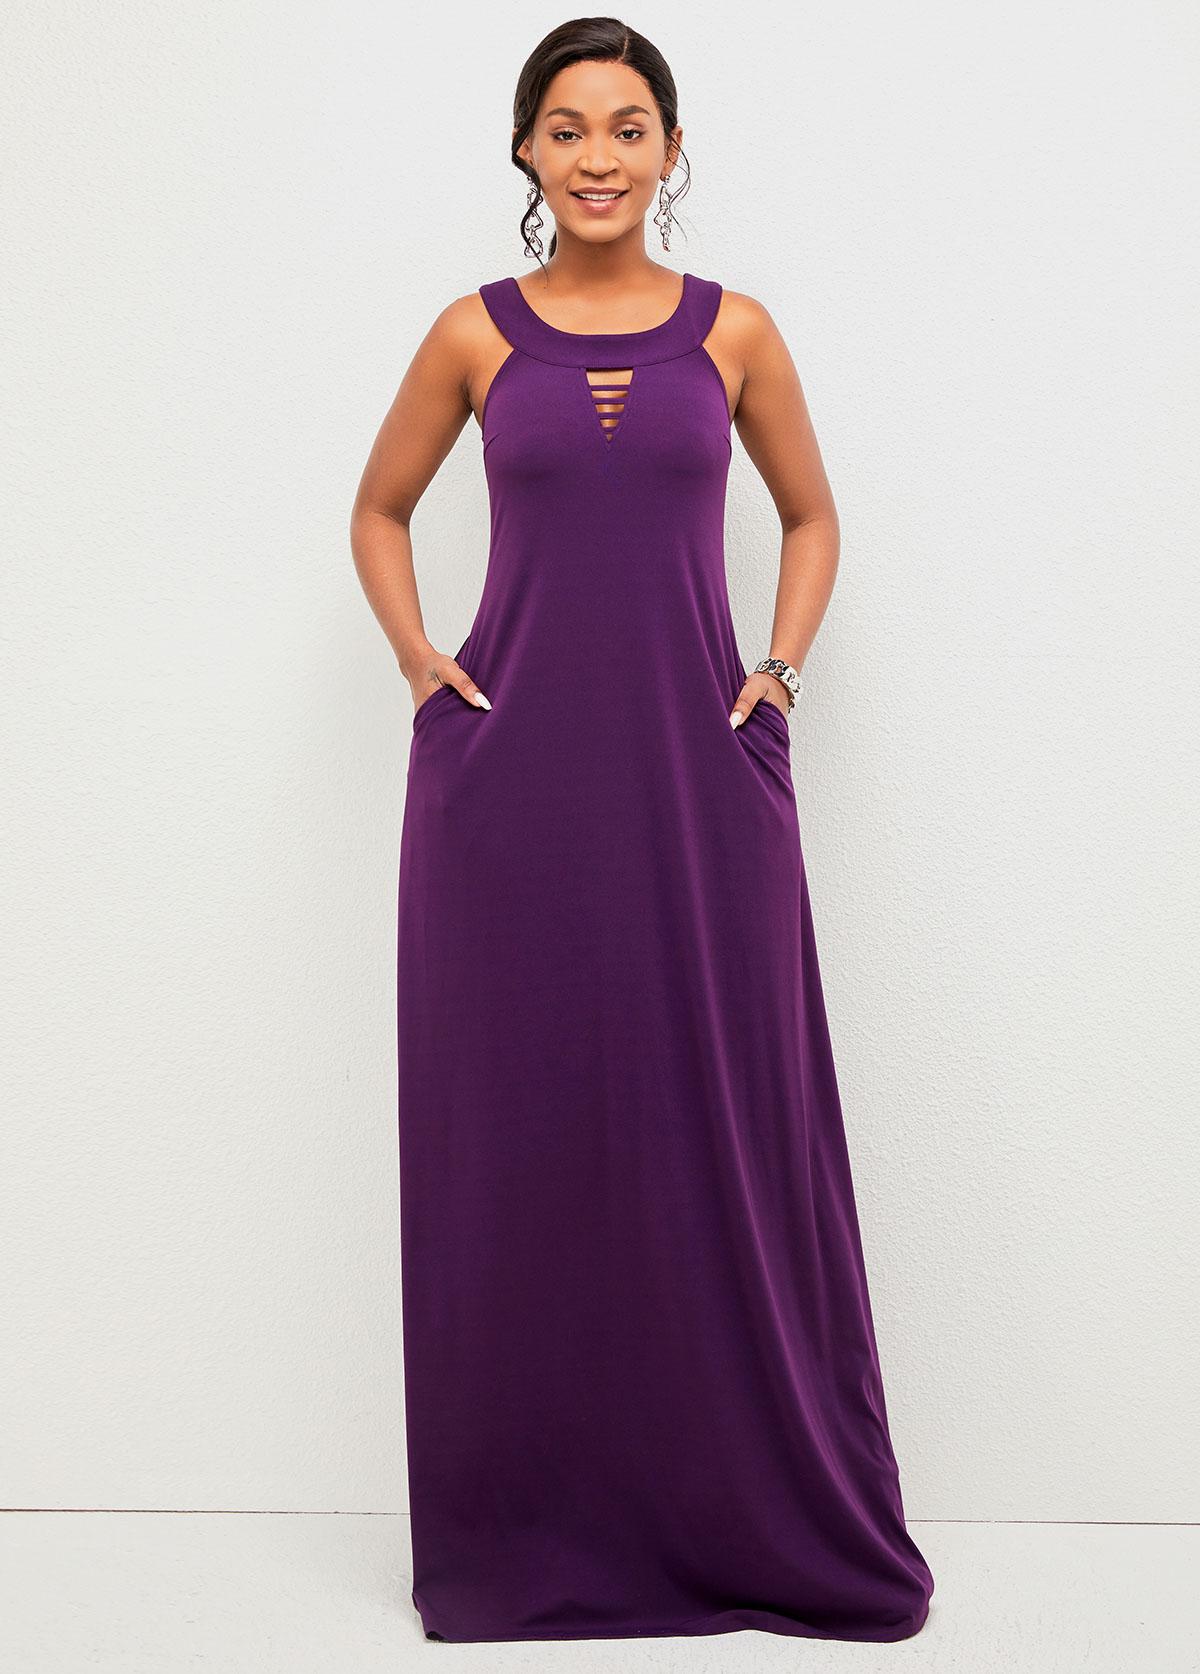 Ladder Cutout Wide Strap Pocket Detail Dress